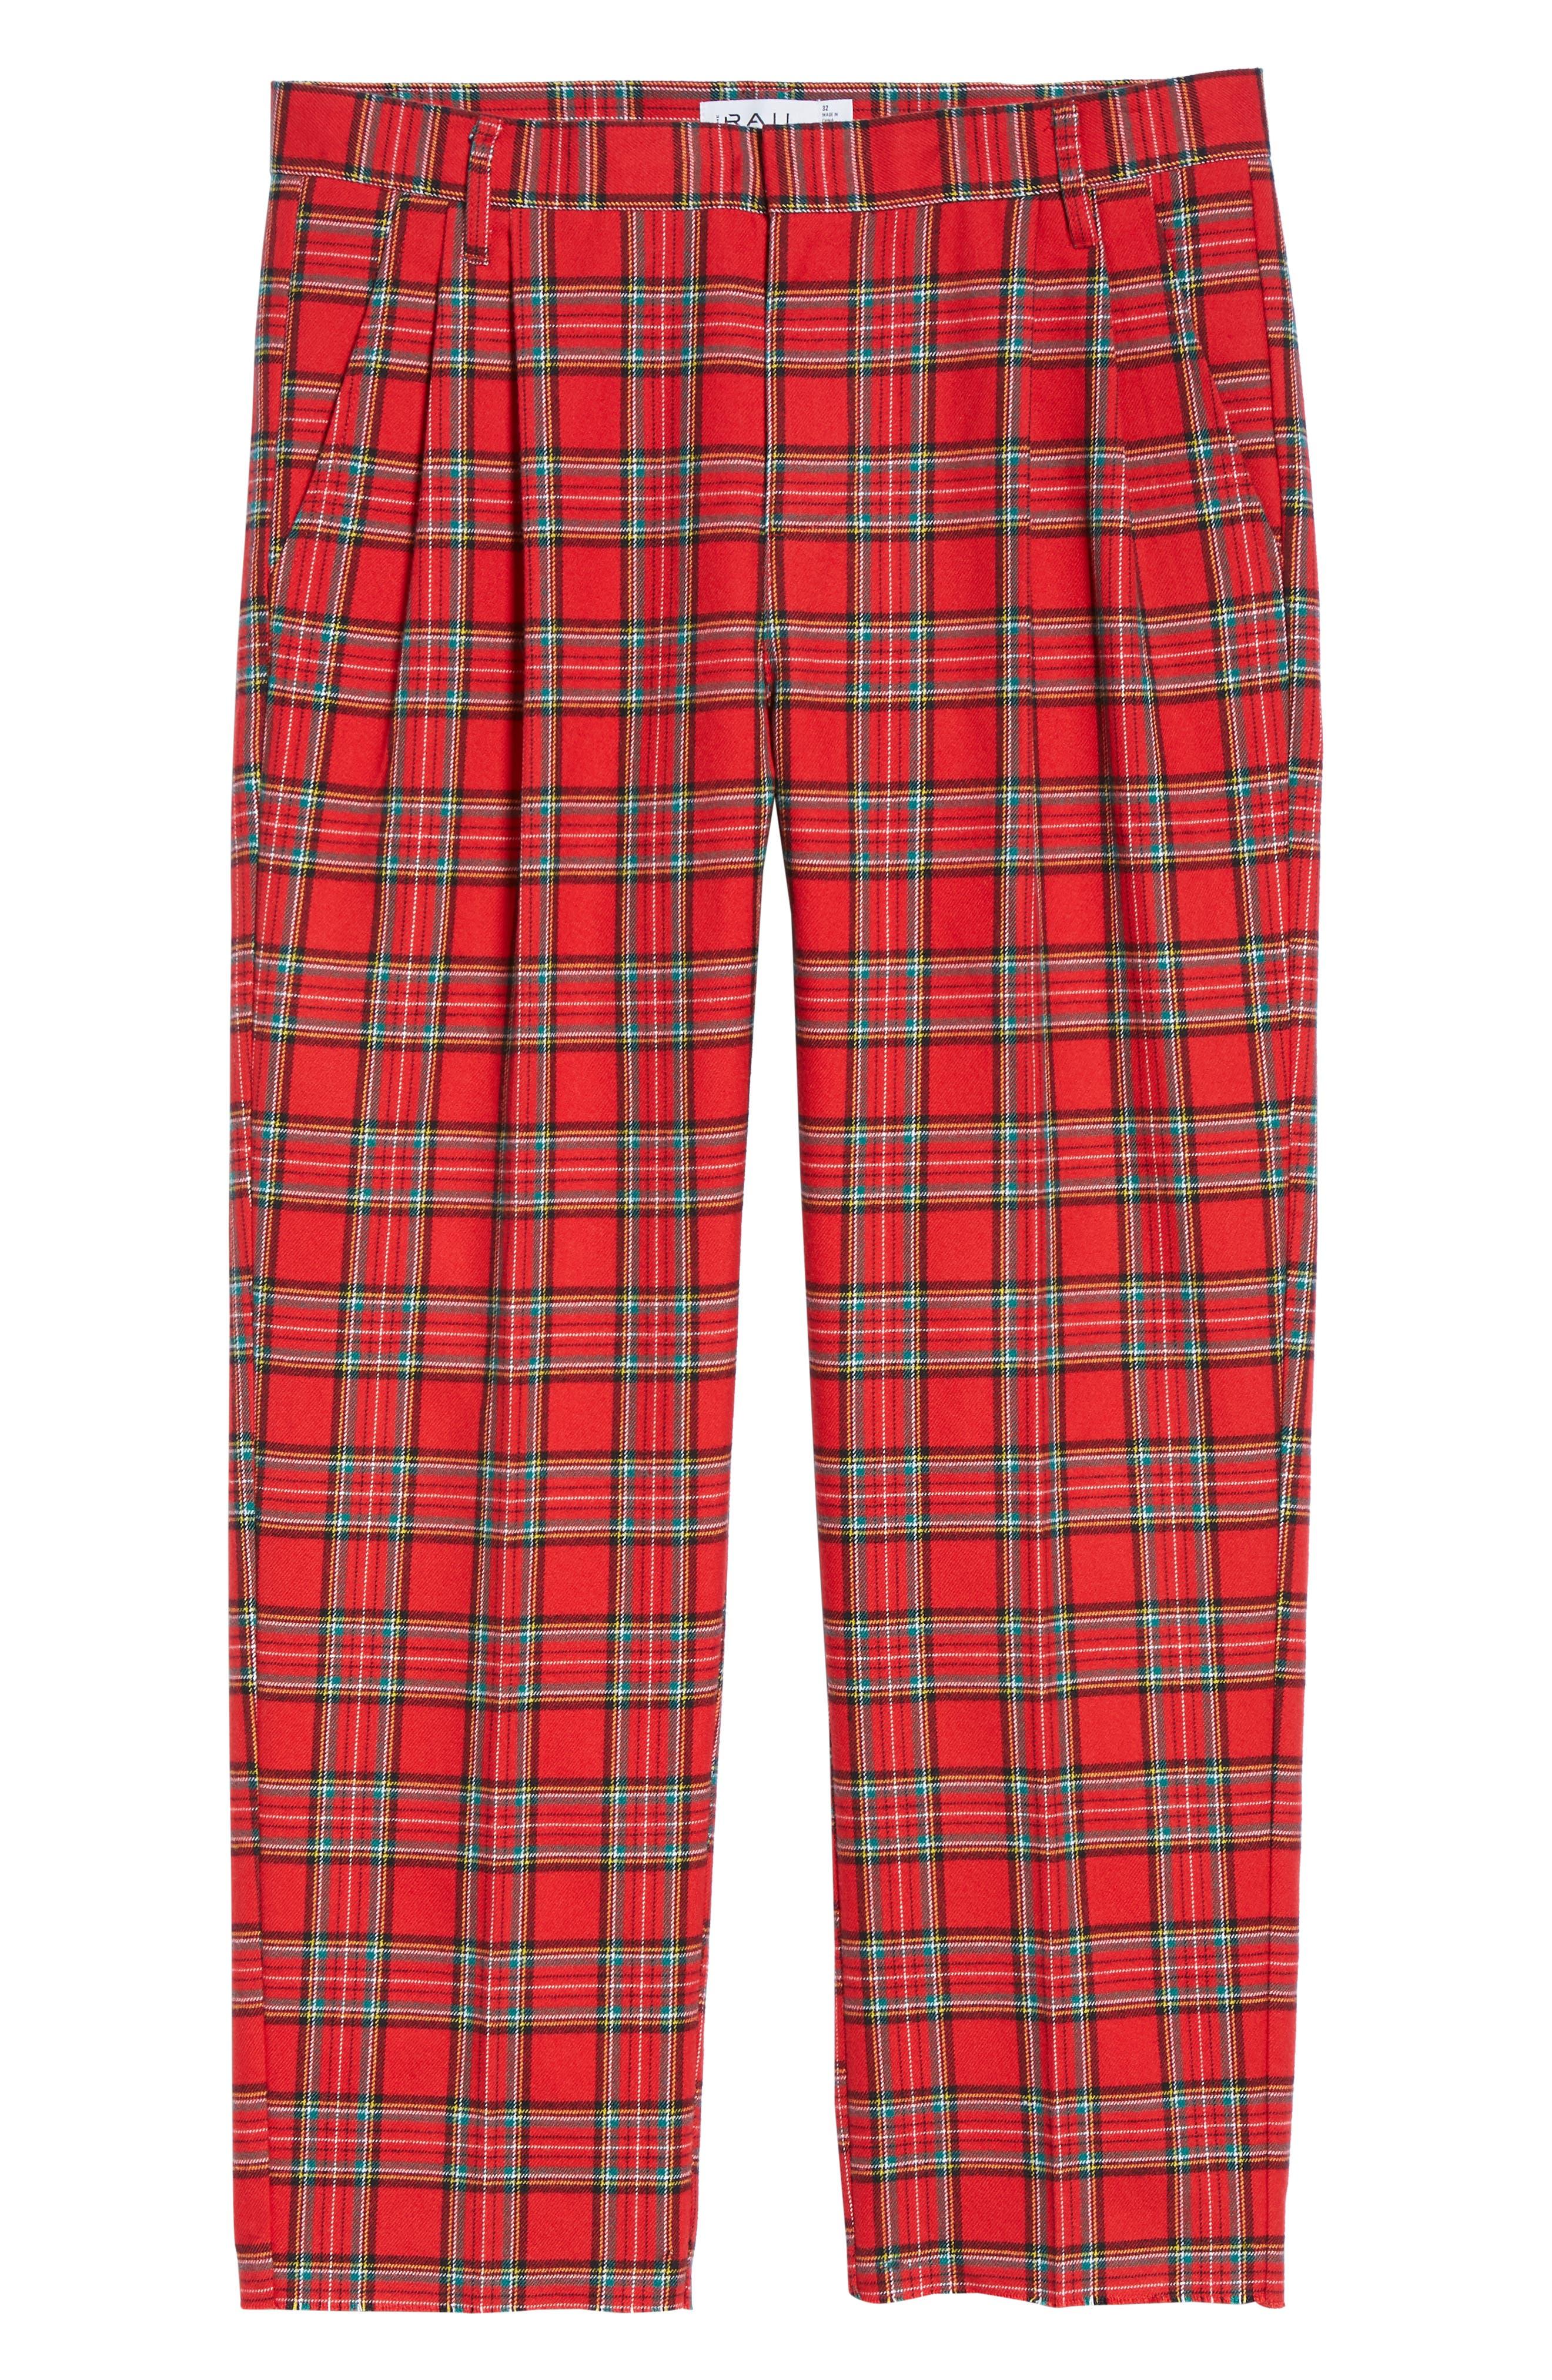 Pleated Plaid Crop Pants,                             Alternate thumbnail 6, color,                             GREY CHARCOAL GLENN PLAID